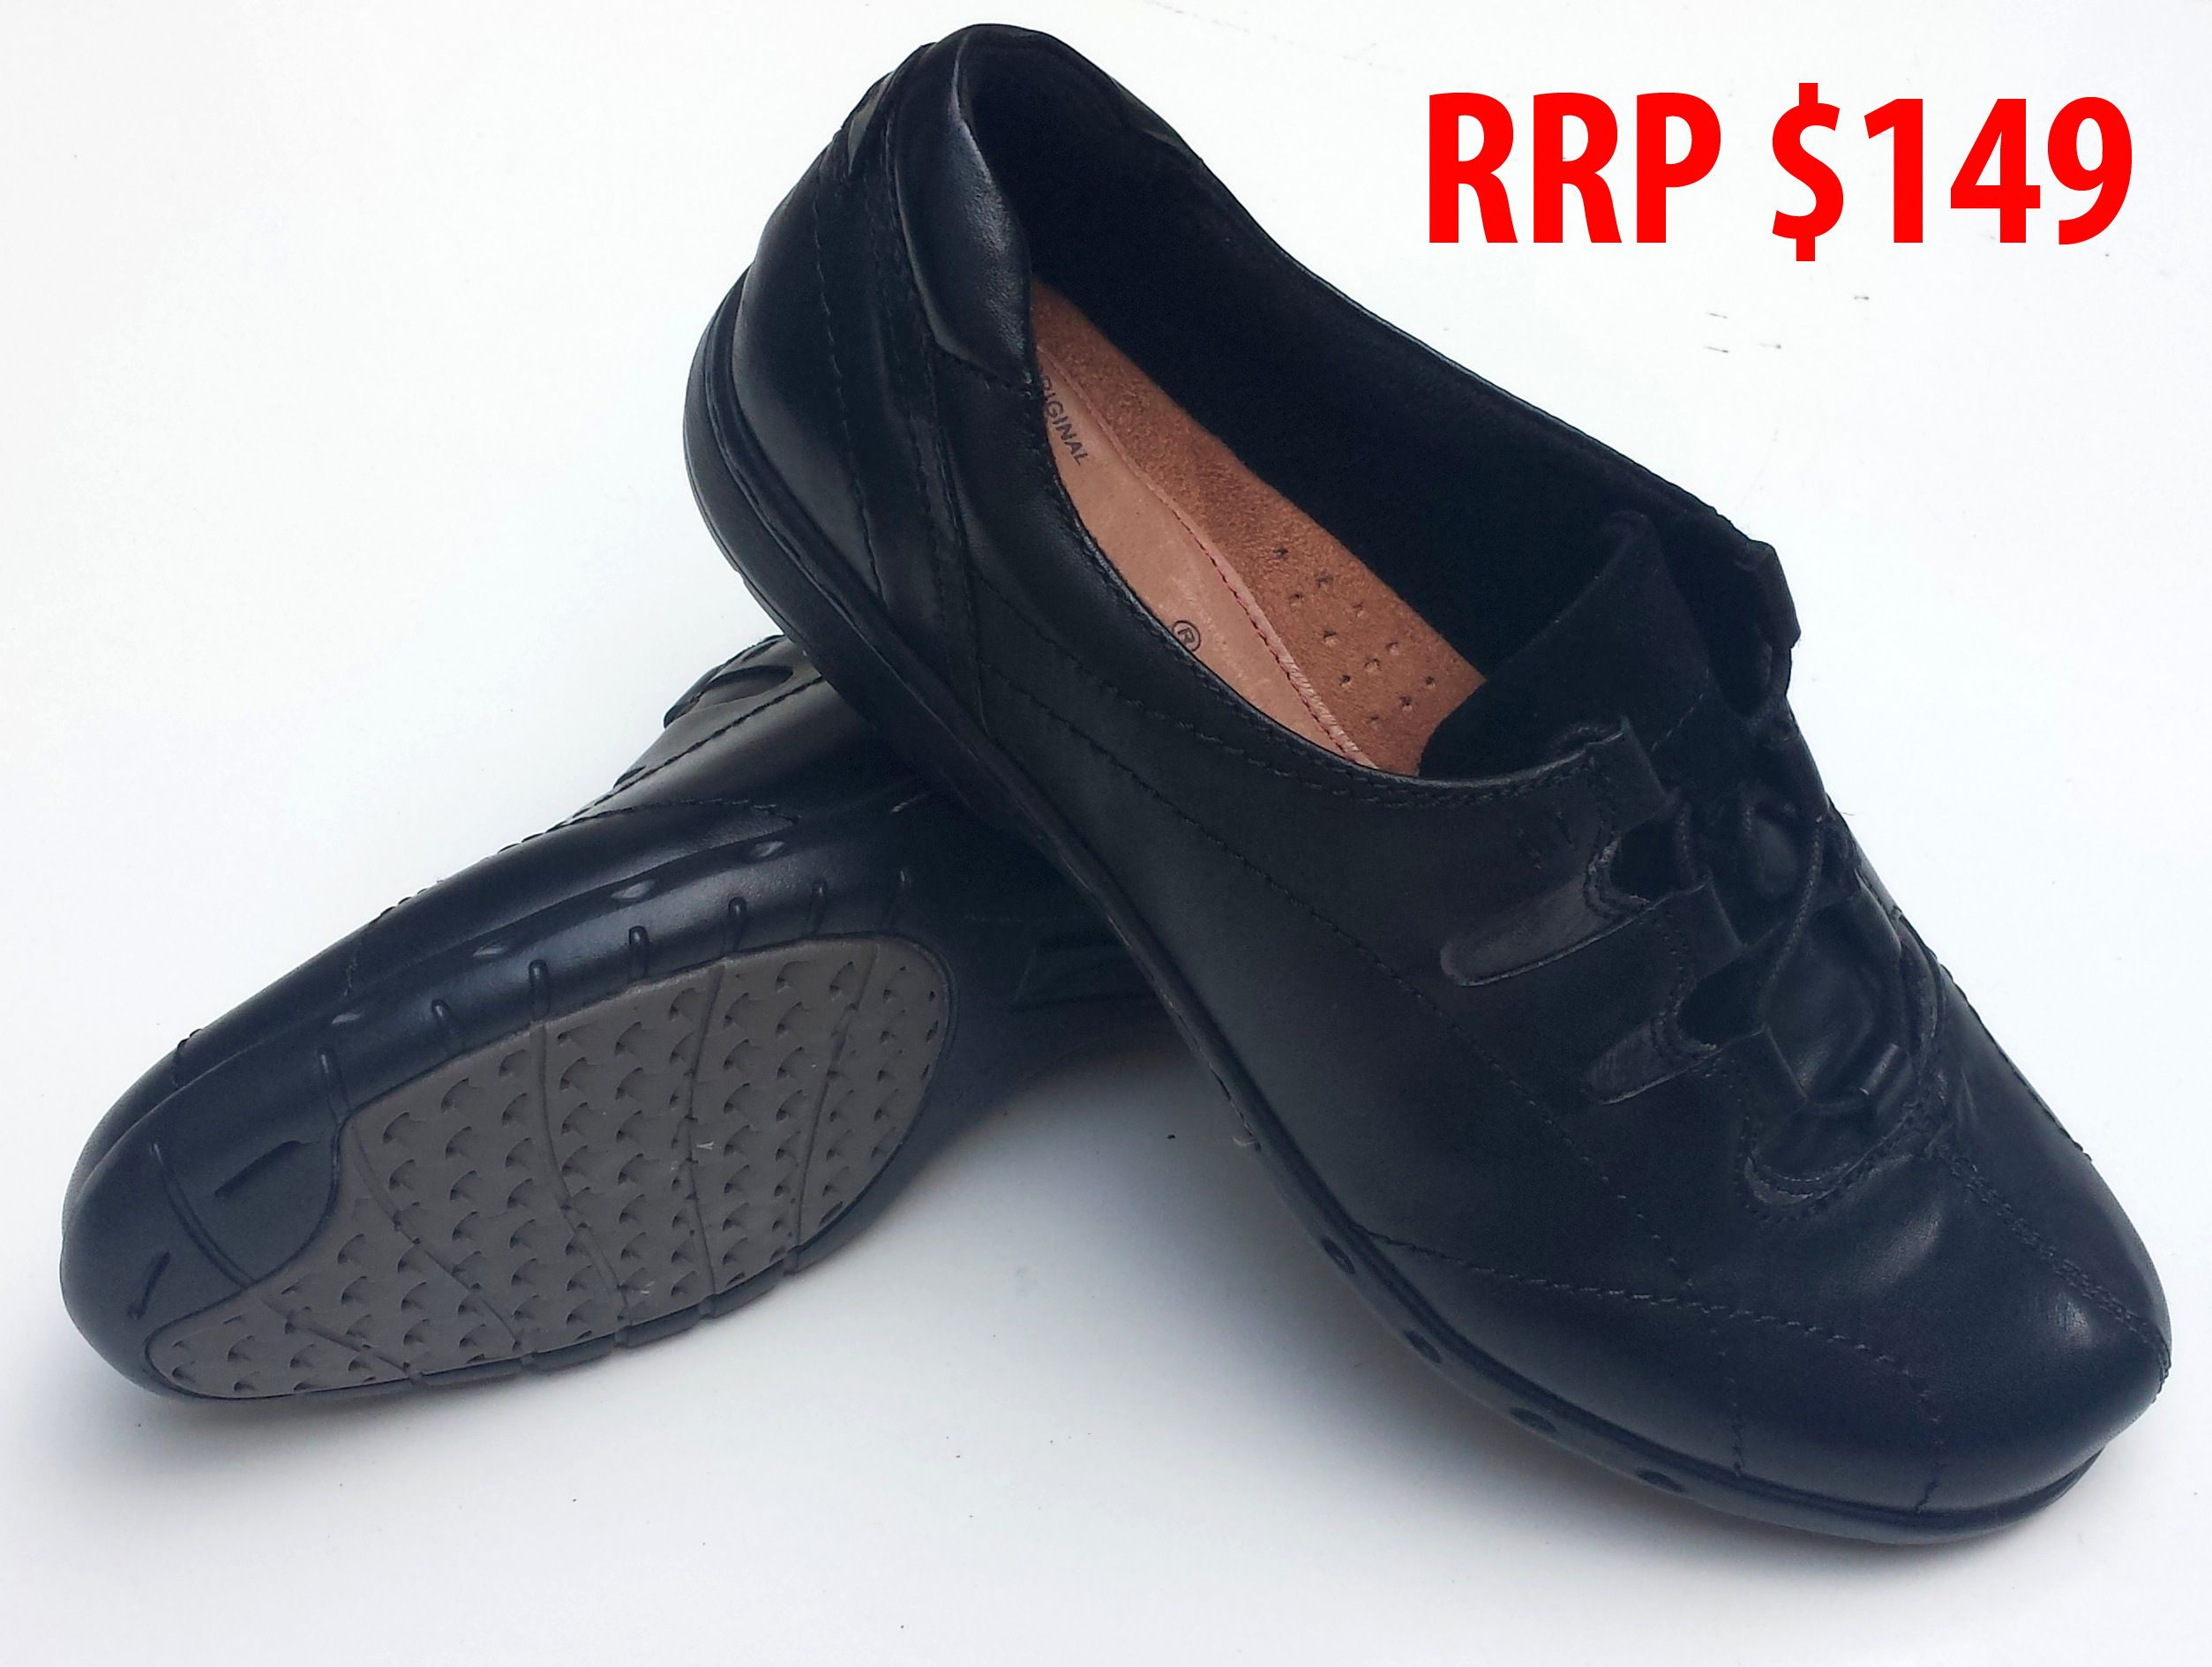 Barani Shoes Rachael Rrp 149 Now 79 Www